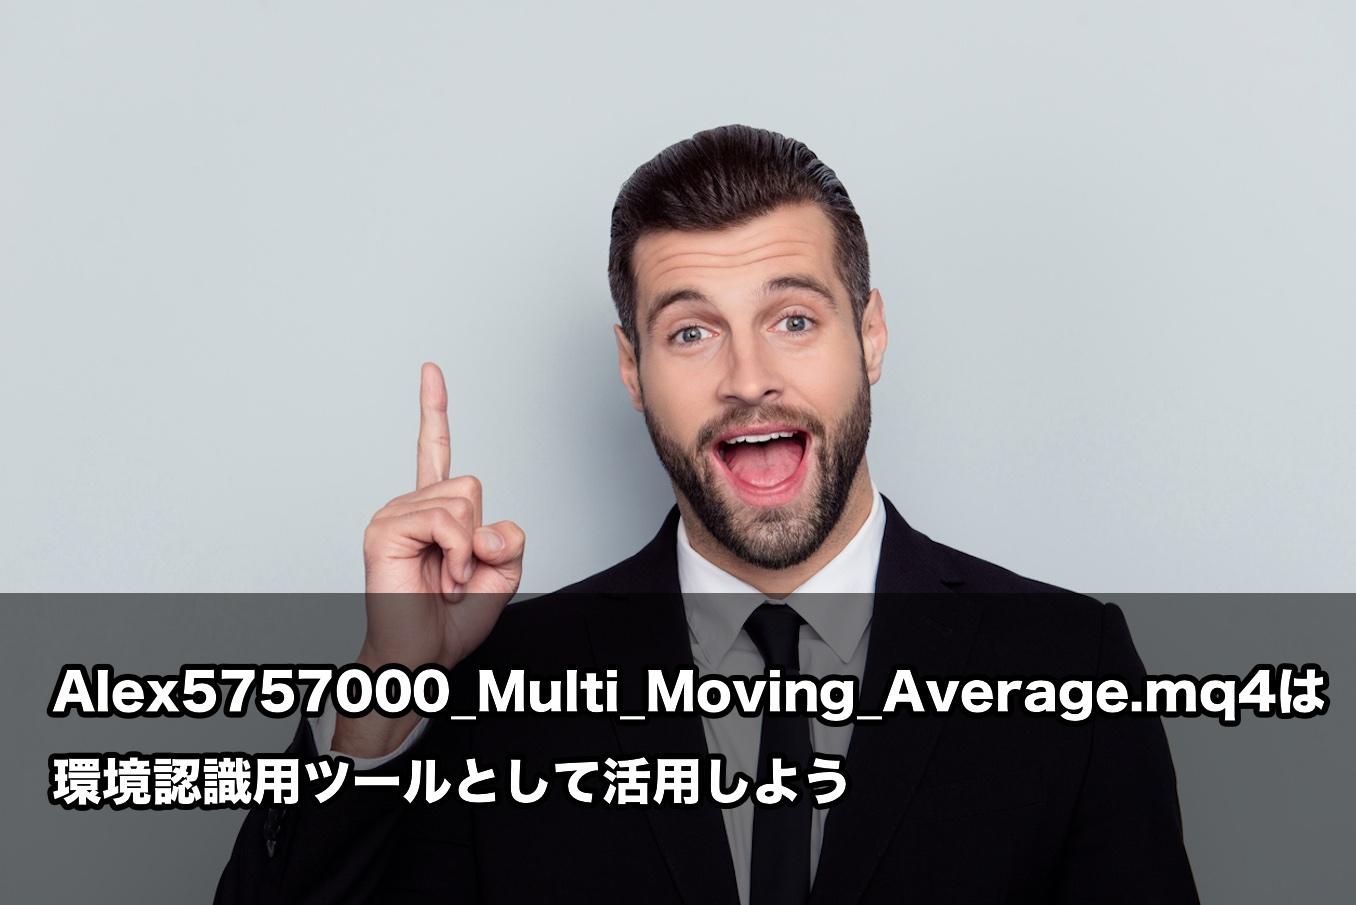 【FX手法】Alex5757000_Multi_Moving_Average.mq4は環境認識用ツールとして活用しよう